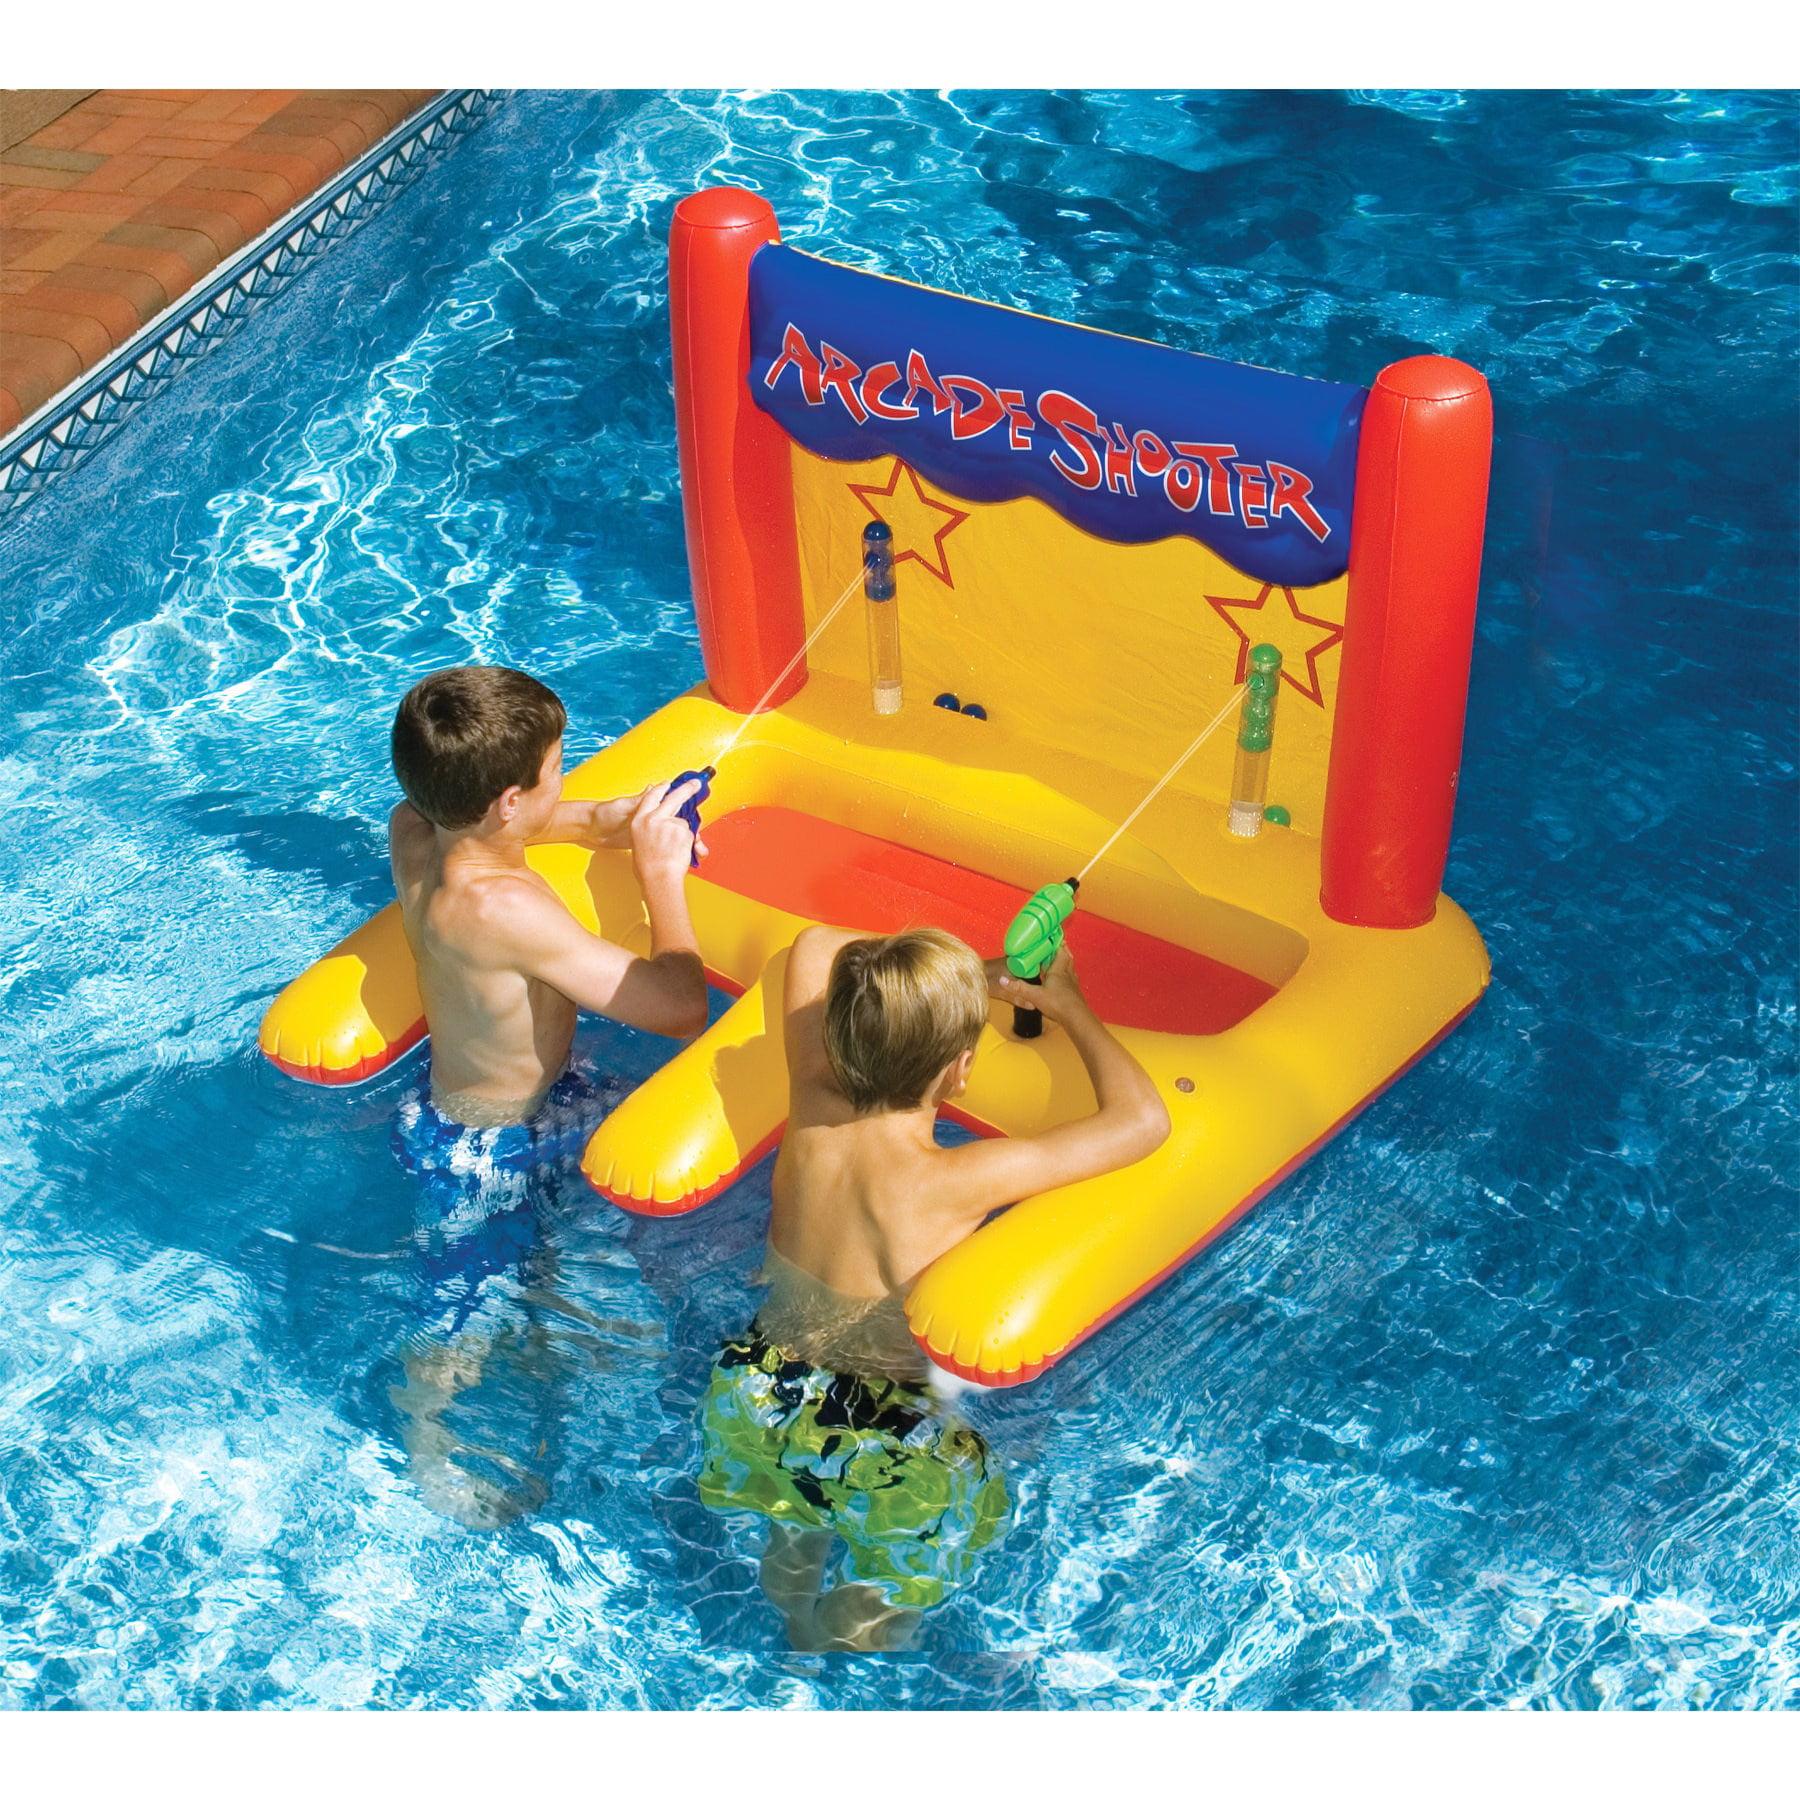 Swimline Vinyl Arcade Water Shooter Pool Toys, Multicolor by Swimline